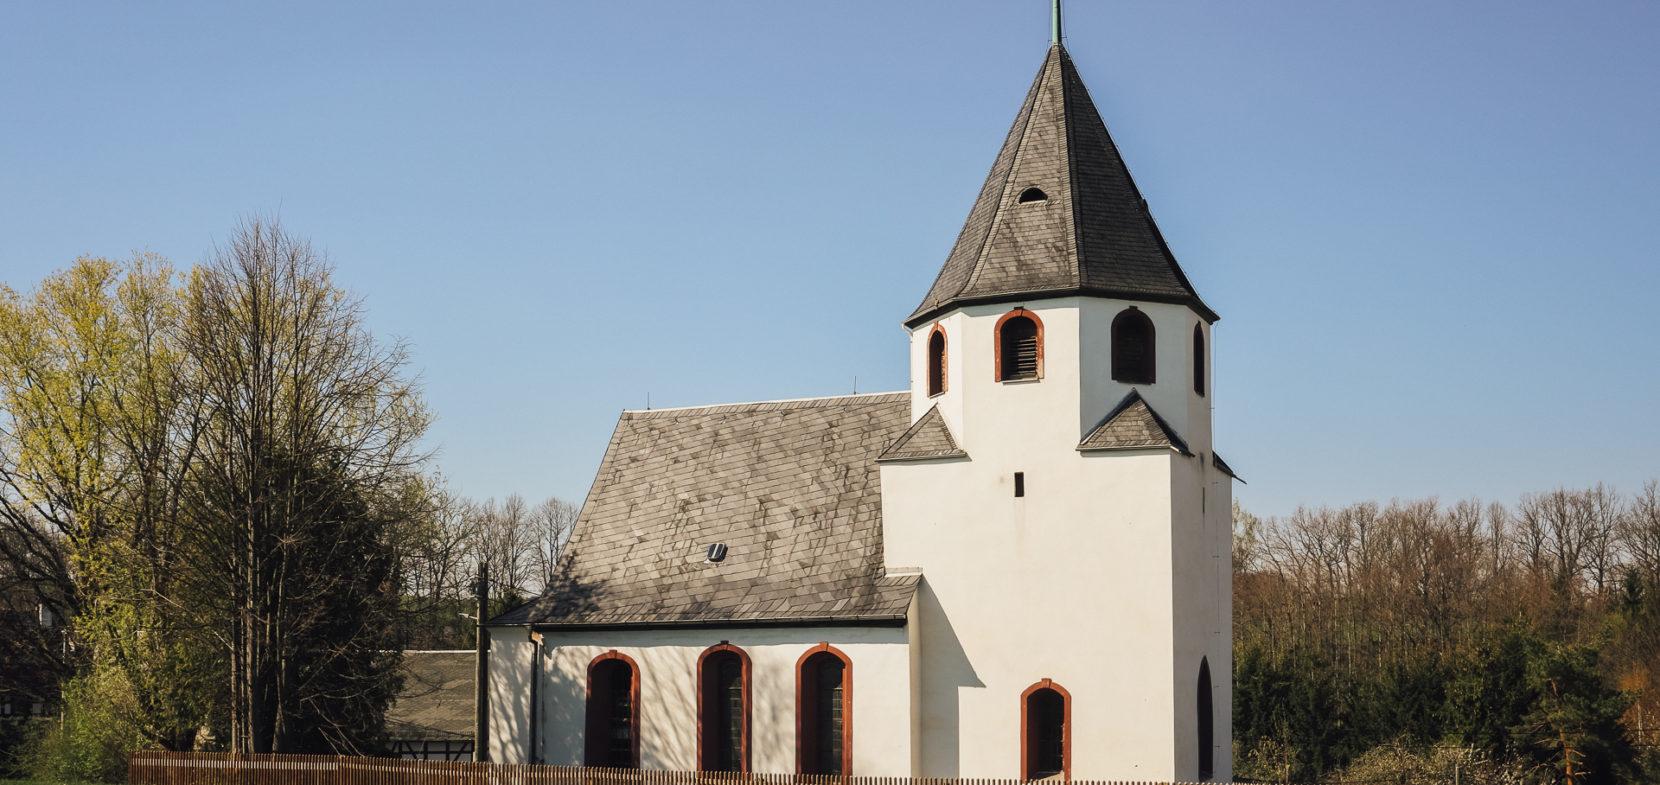 St. Petri Kleinbernsdorf